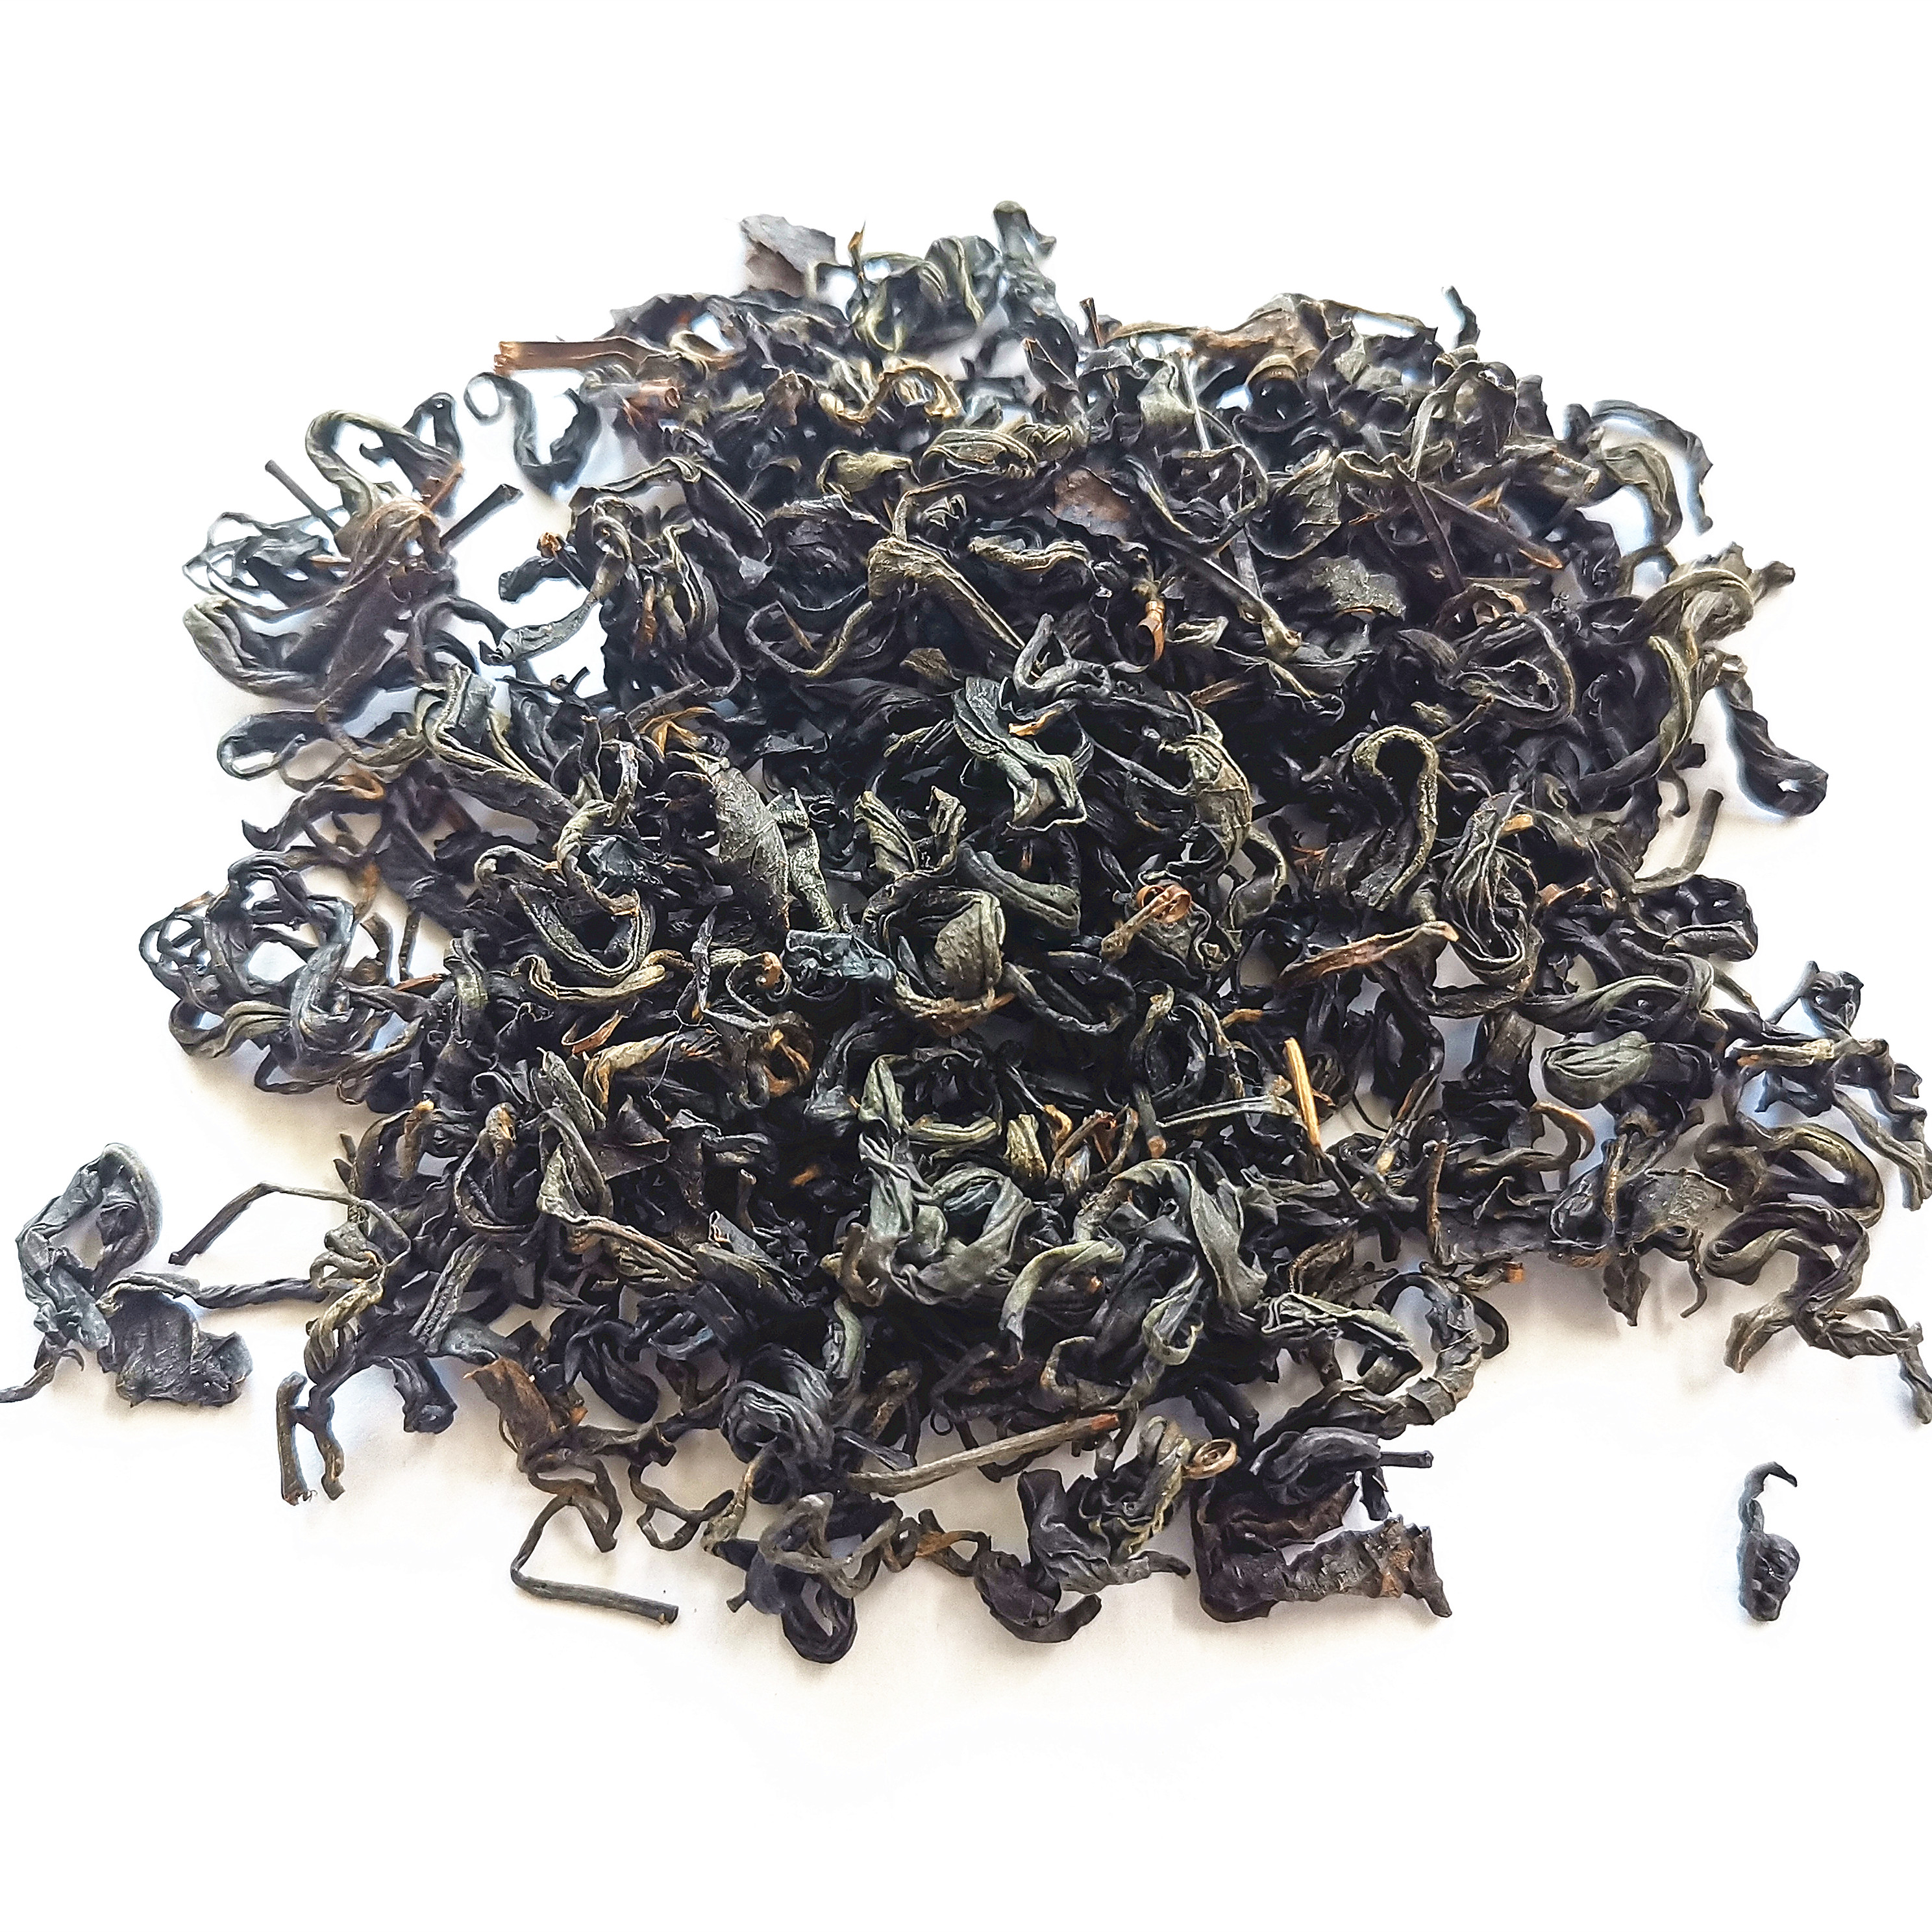 A-black tea Best Selling Natural Loose Organic Tea Leaves Orthodox organic Black Tea - 4uTea   4uTea.com